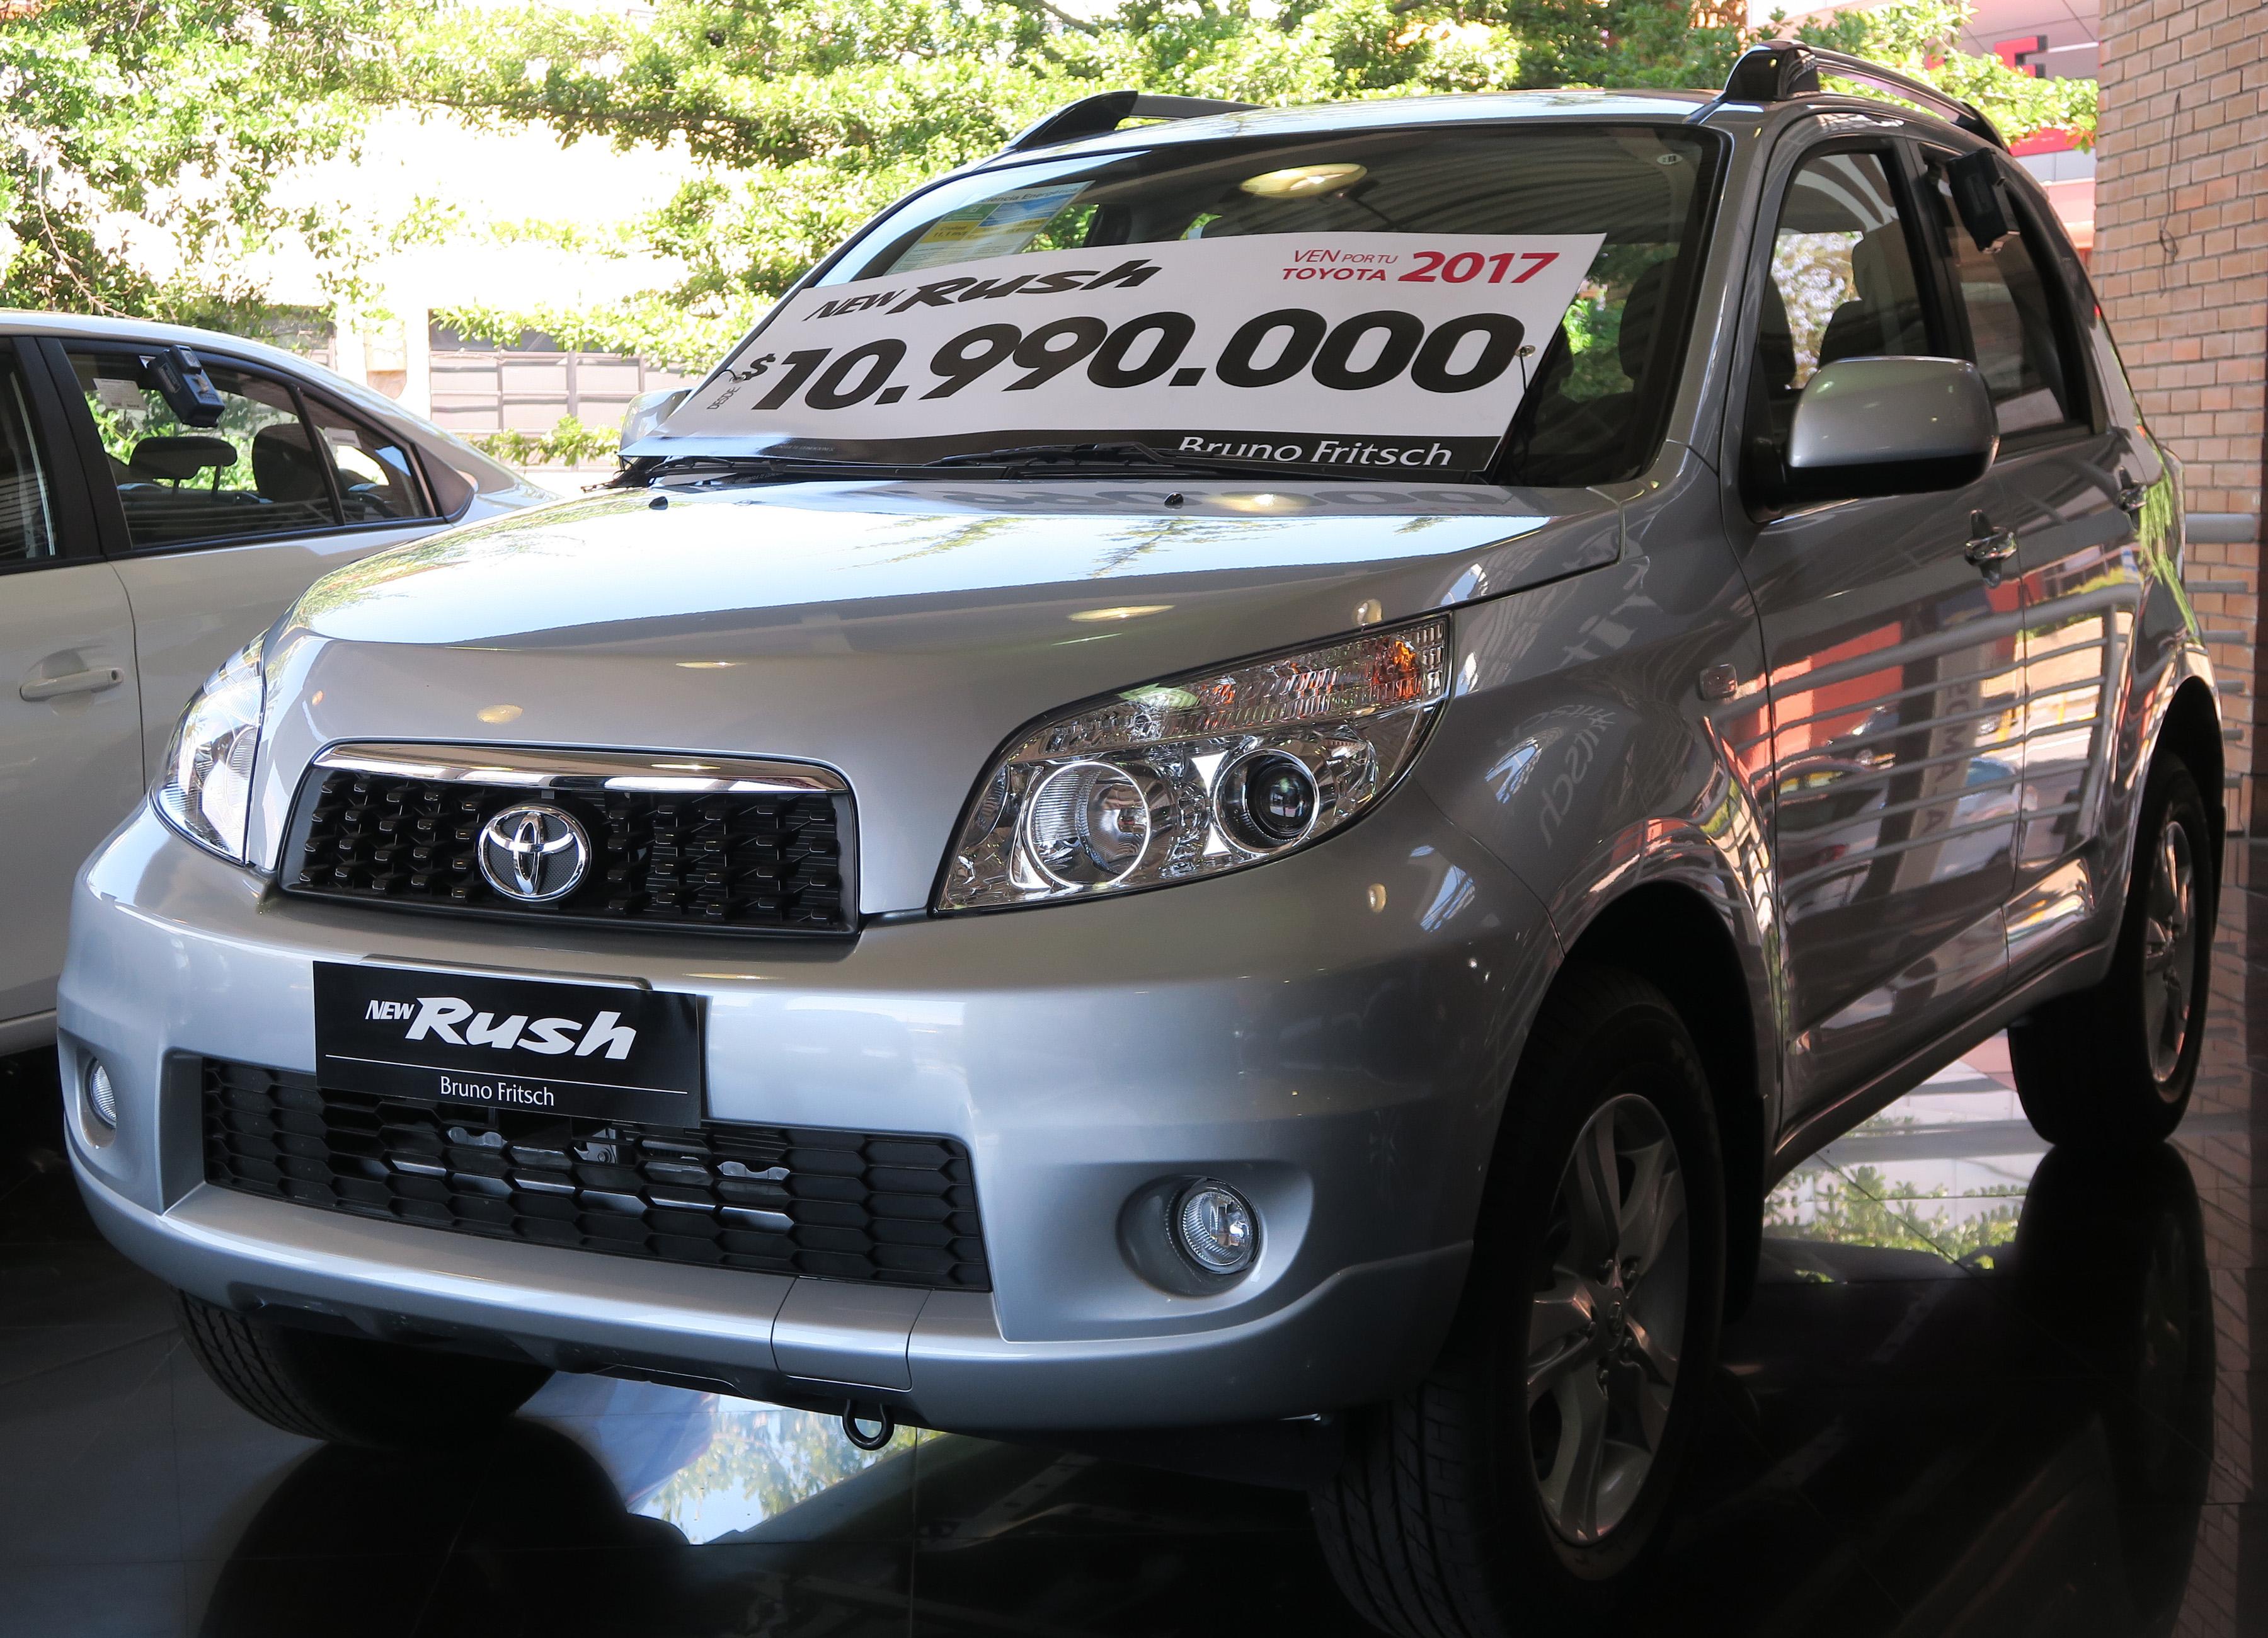 Kelebihan Kekurangan Toyota Rush 2017 Murah Berkualitas